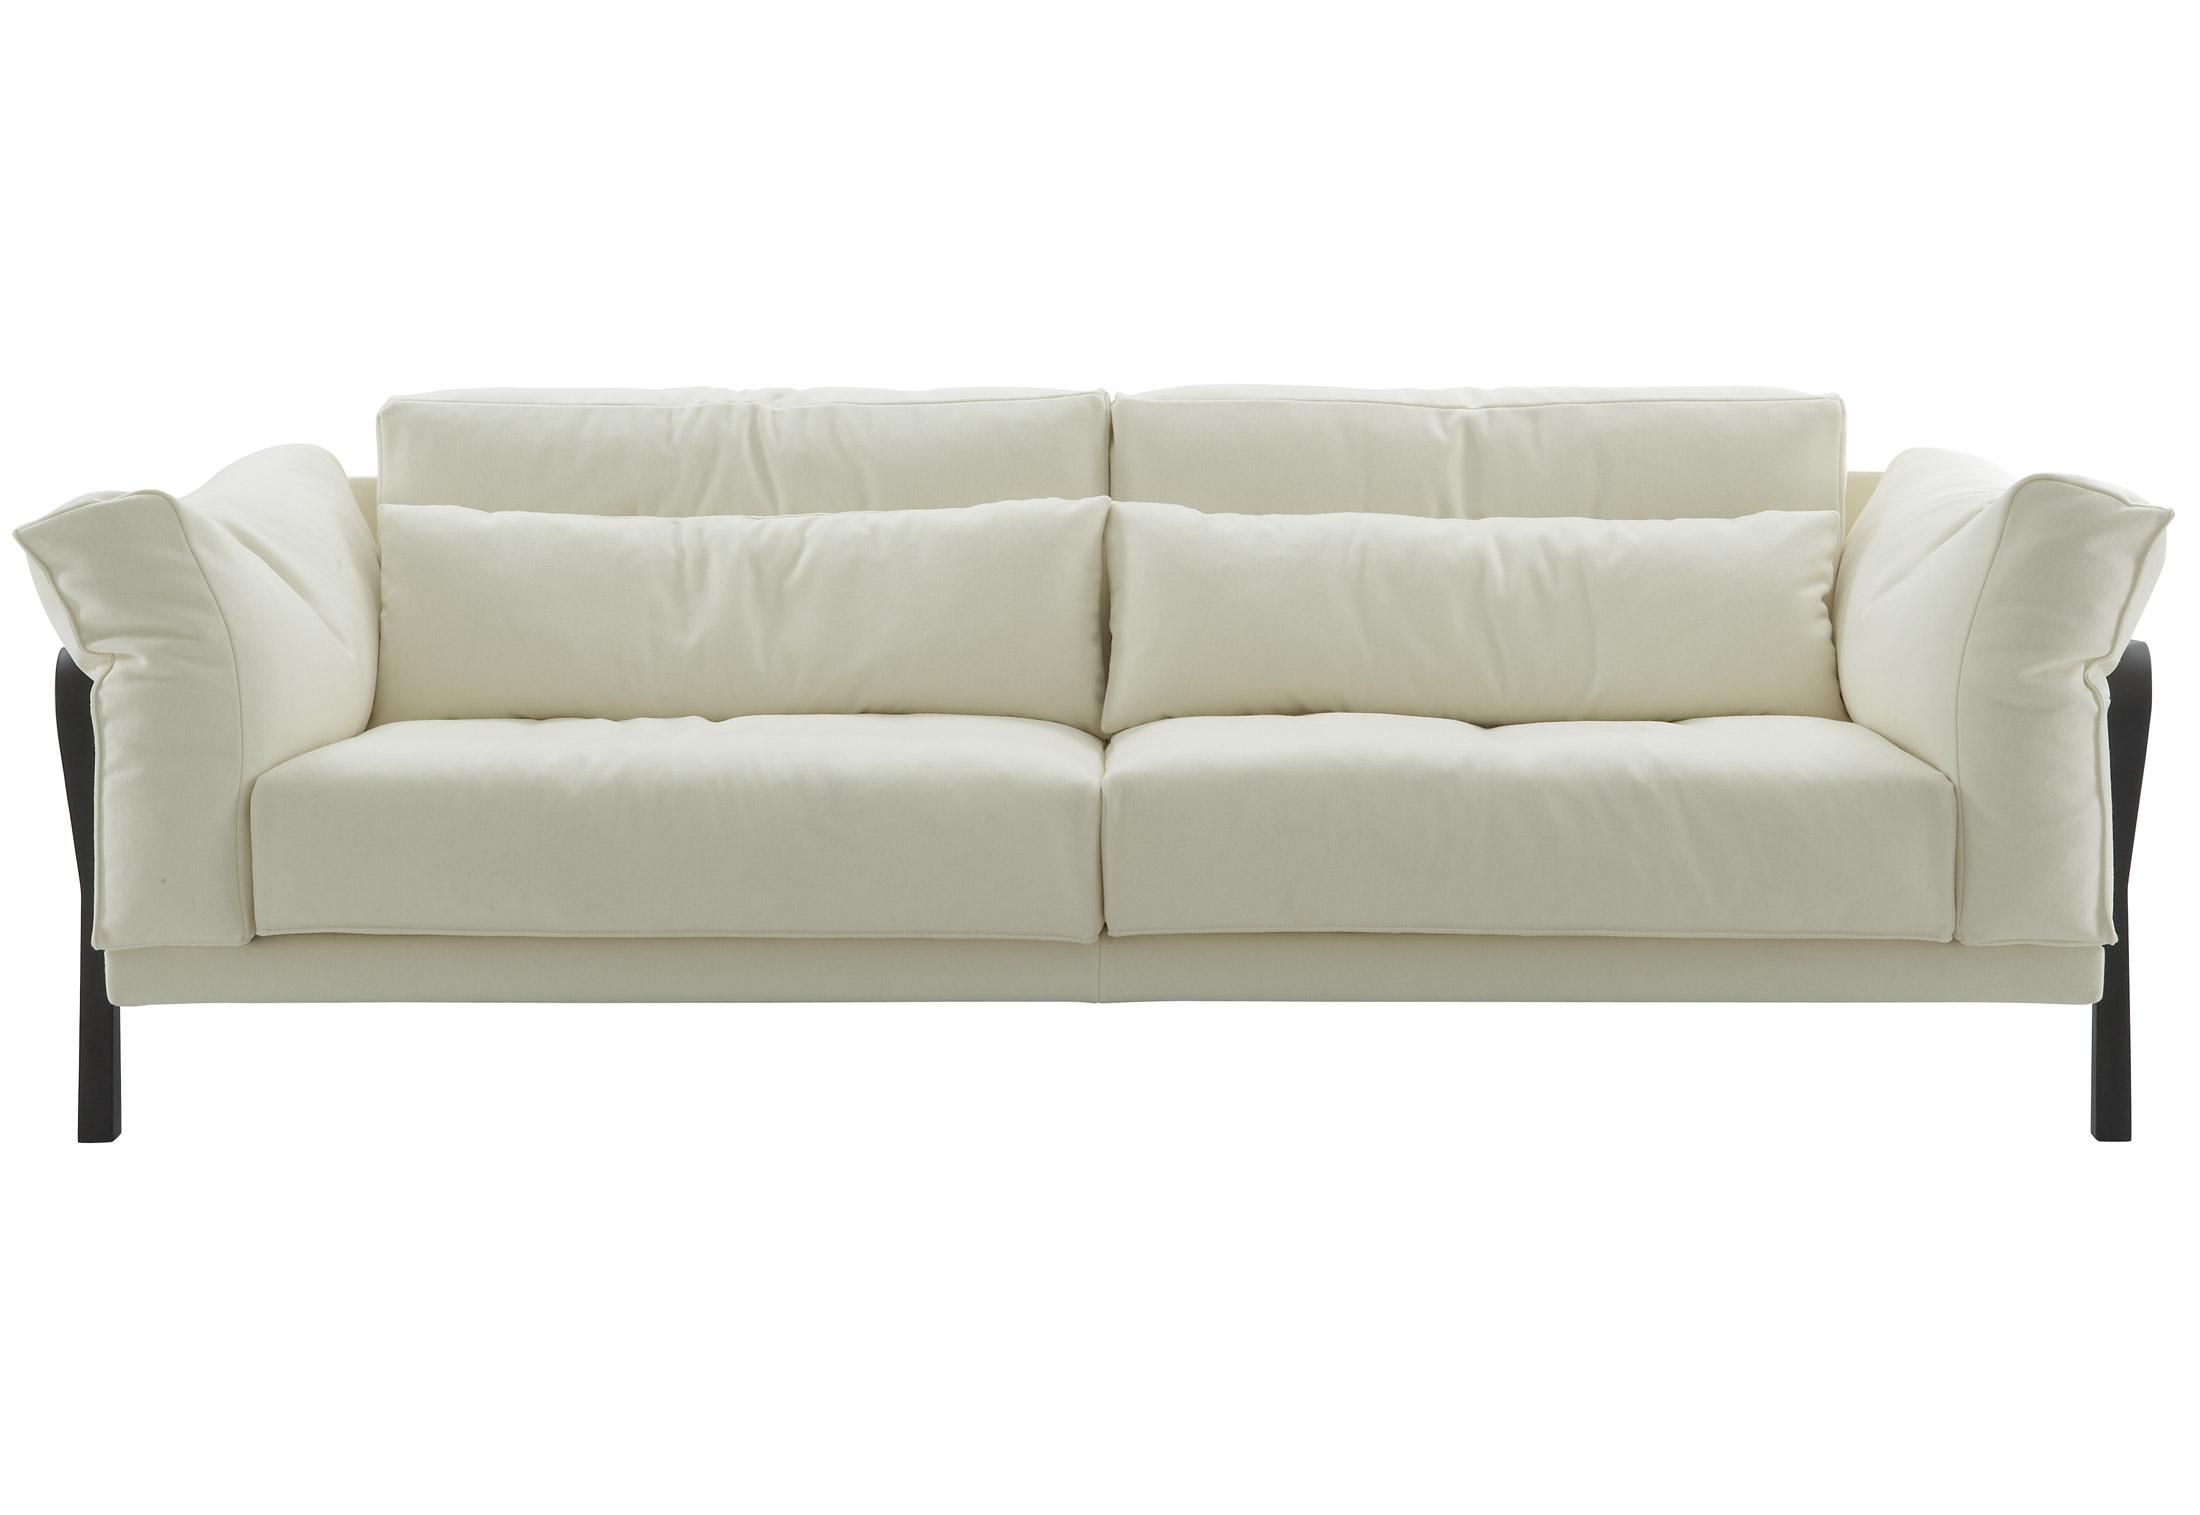 Full Size of Ligne Roset Sofa Feng Bed Multy Ploum Review Couch For Sale Ebay Prado Yang Ruche Furniture Used Togo Uk Cover Replica Cityloft By Stylepark Spannbezug Sofa Ligne Roset Sofa